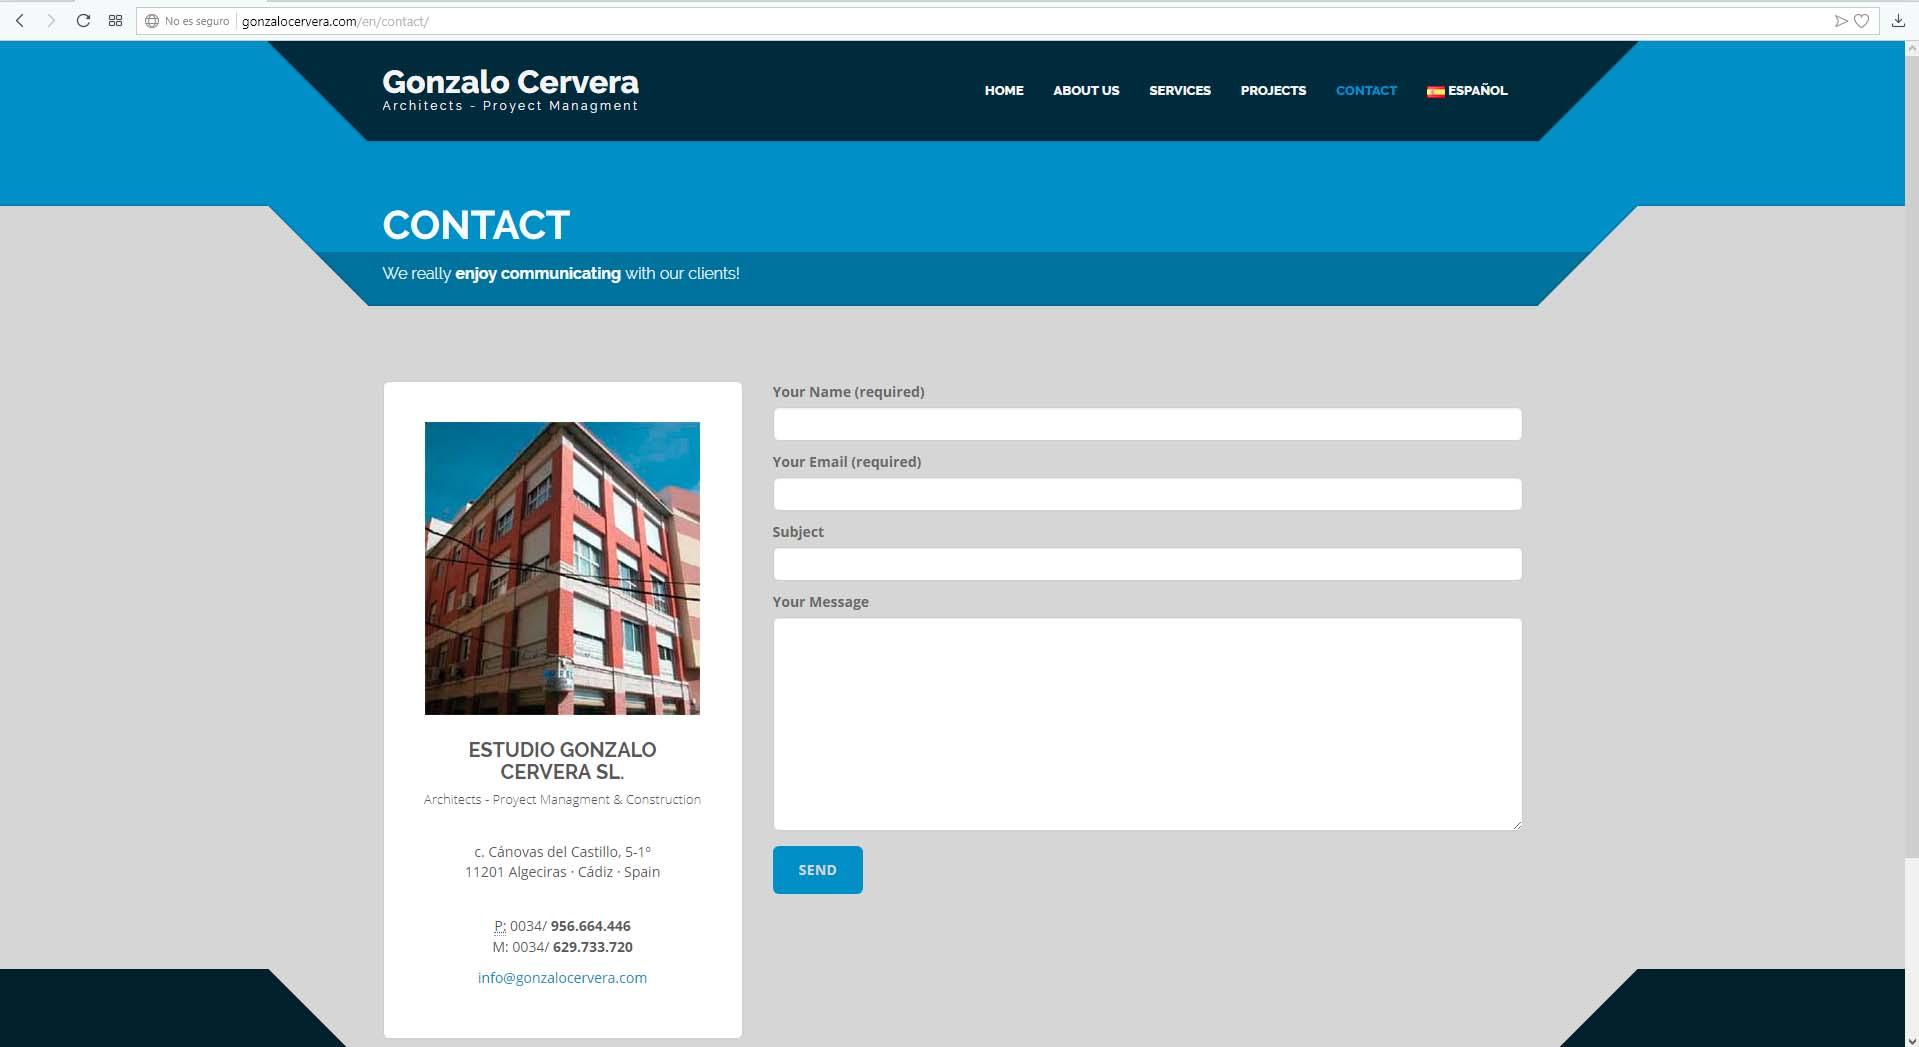 Página Web Gonzalo Cervera